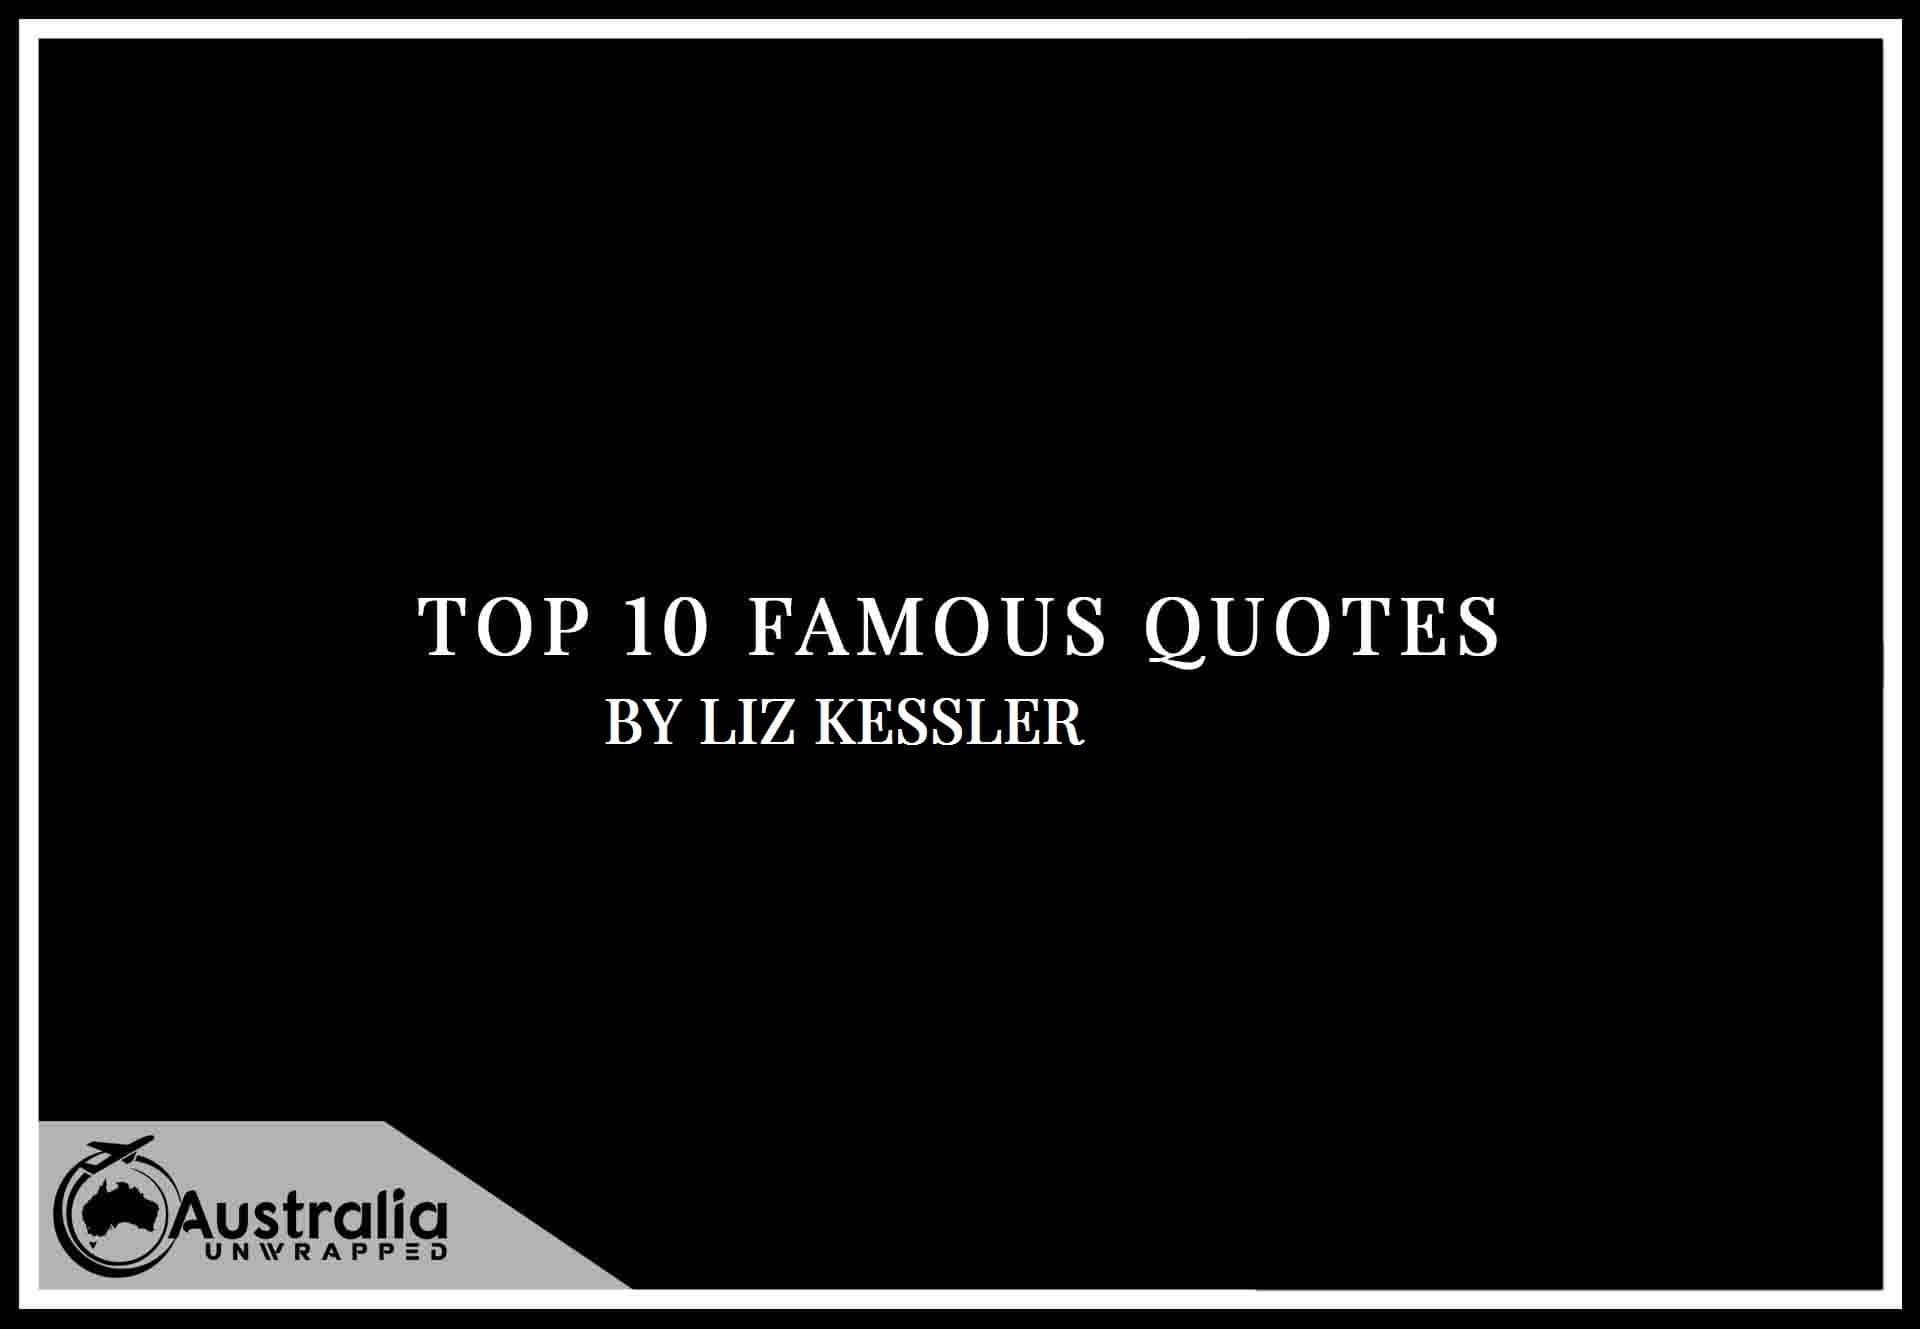 Liz Kessler's Top 10 Popular and Famous Quotes